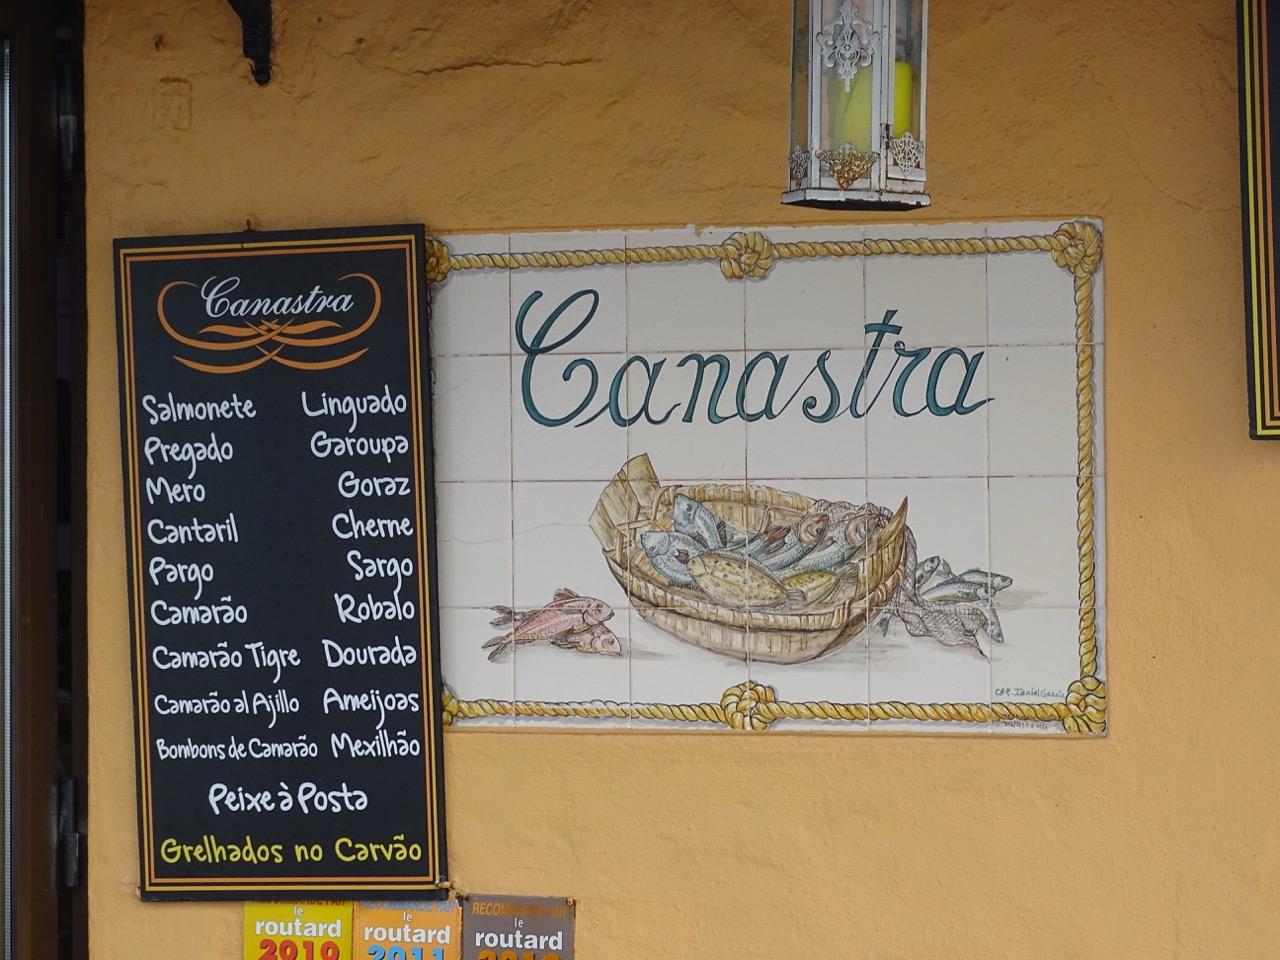 Canastra restaurant